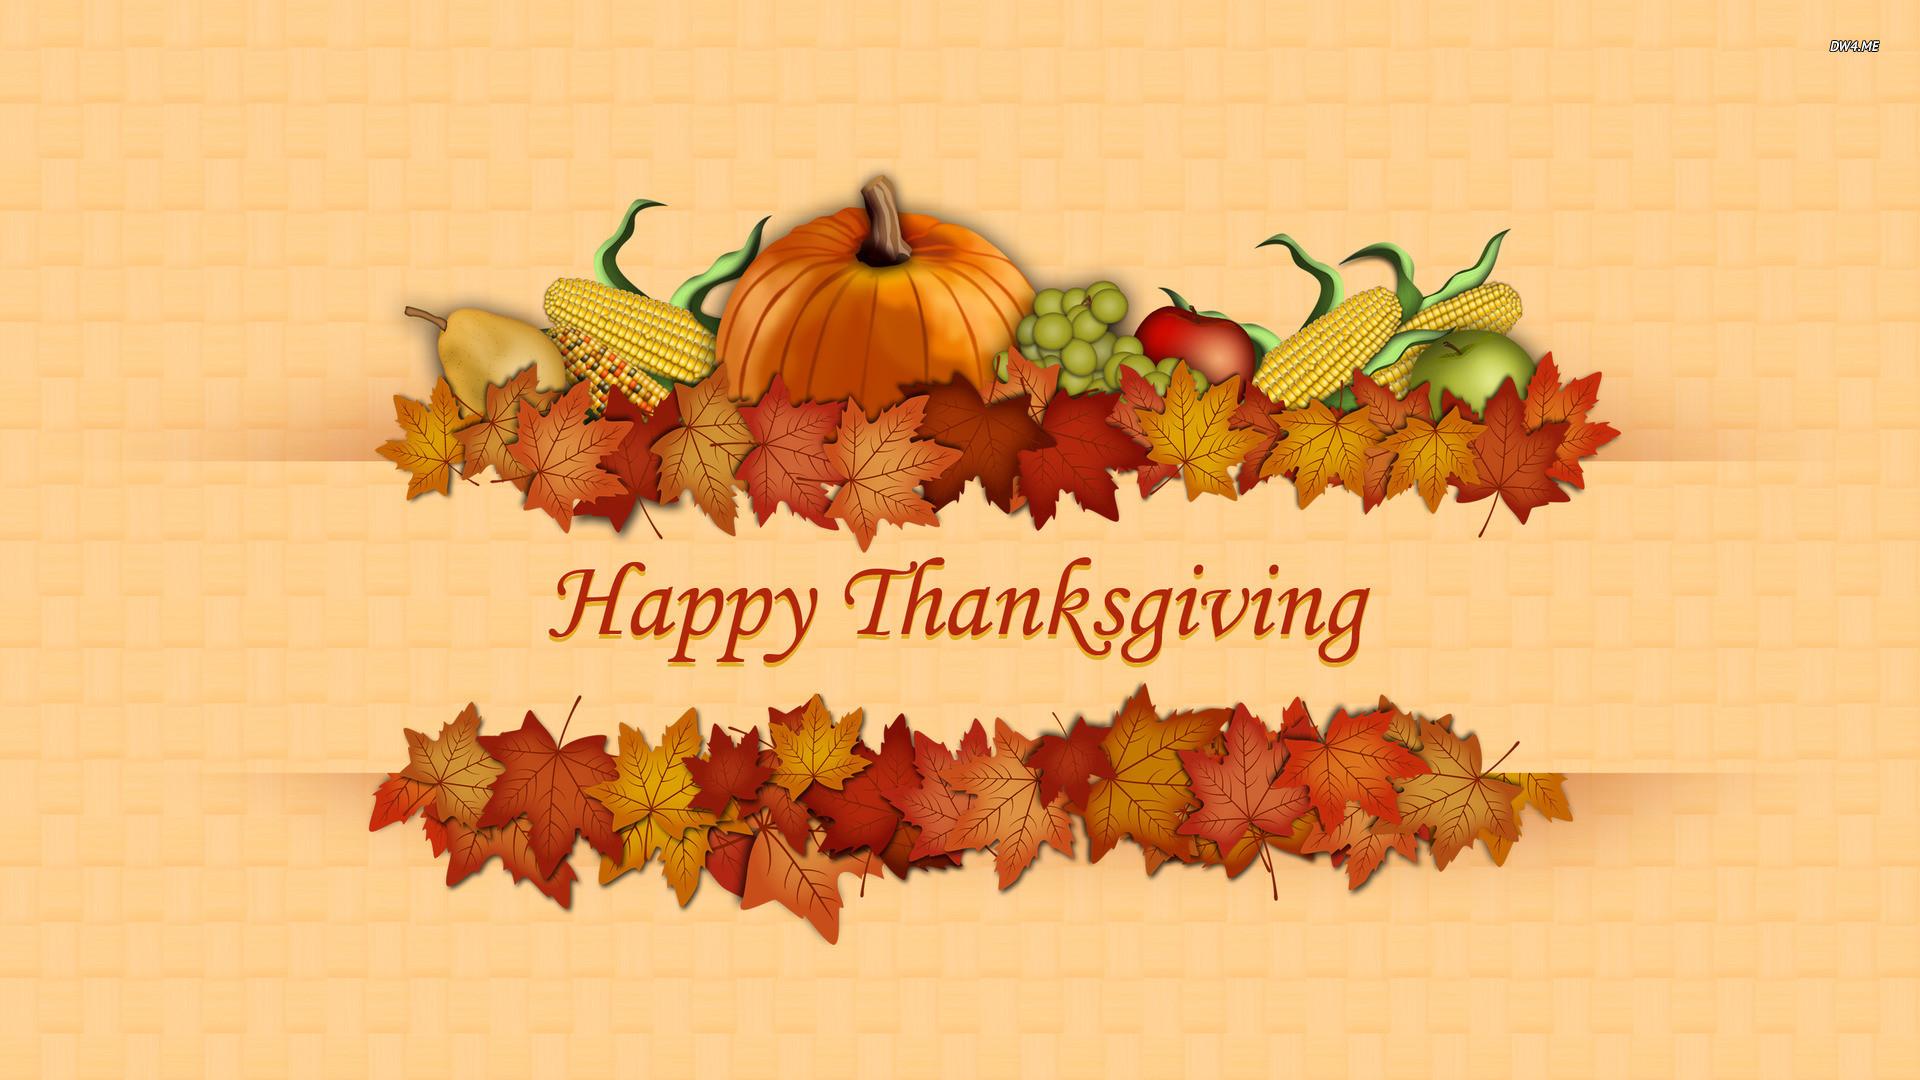 Free Thanksgiving Wallpapers HD & Desktop Backgrounds